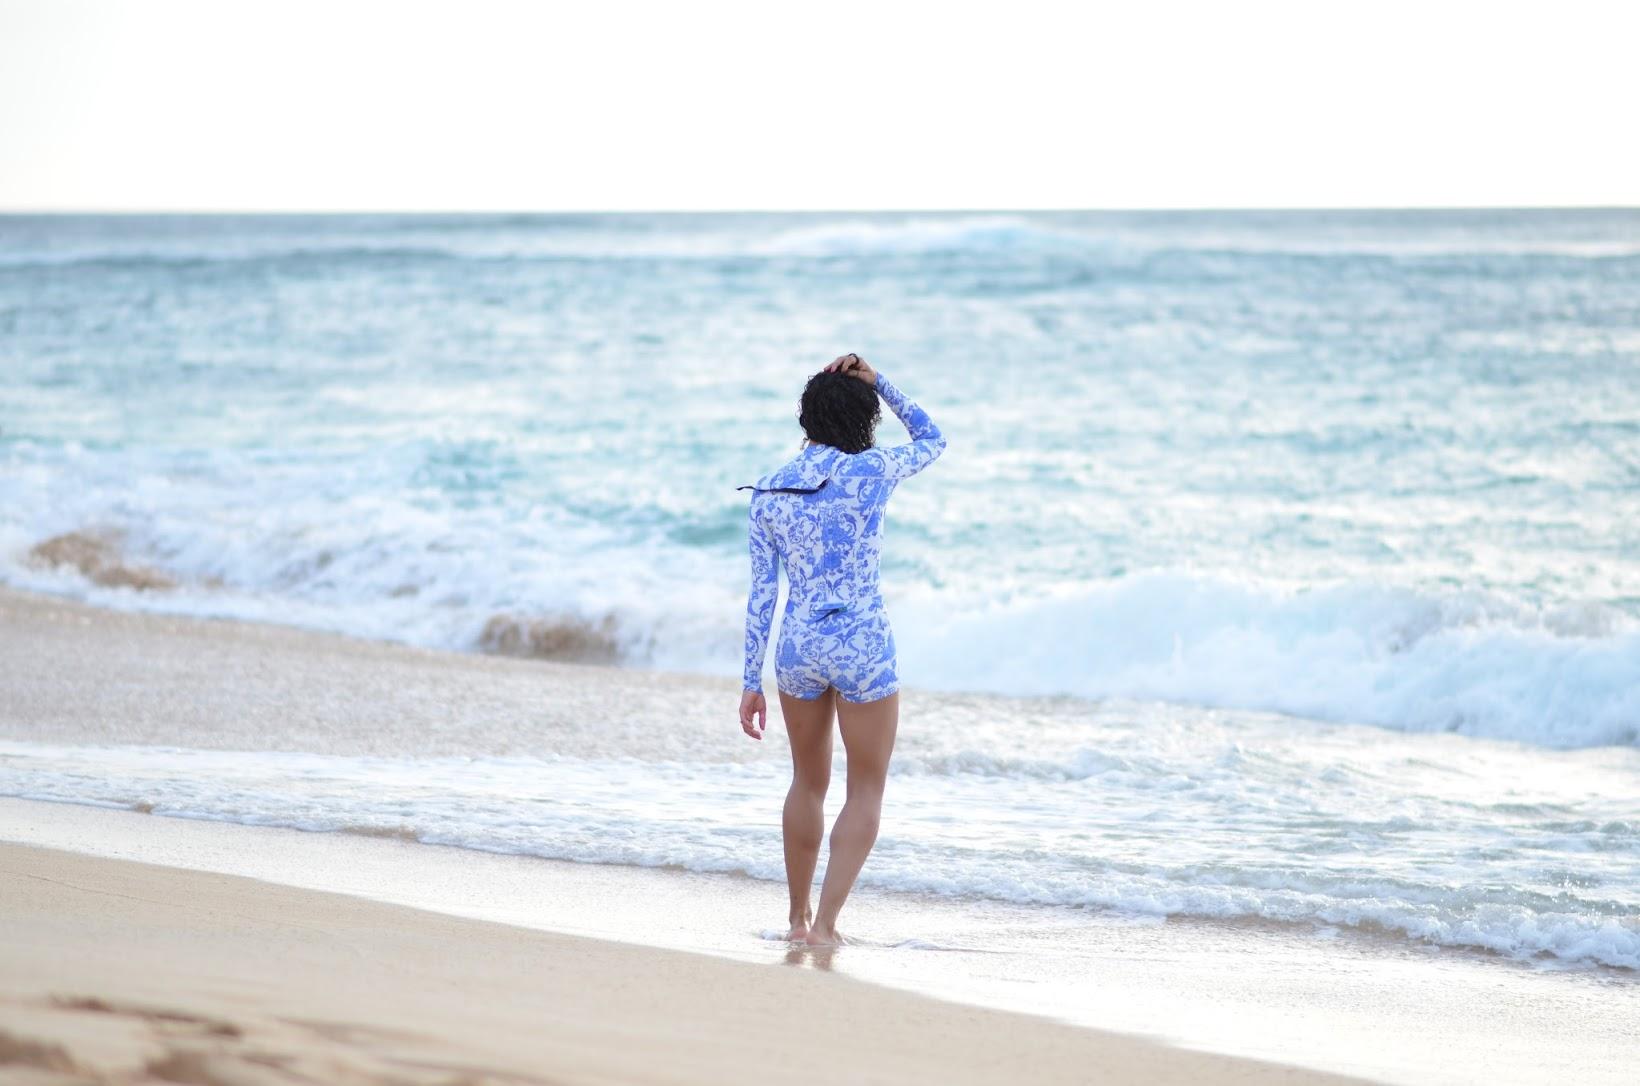 Cynthia Rowley wetsuit, blue ruffle crop top, sunset beach oahu, curly hair